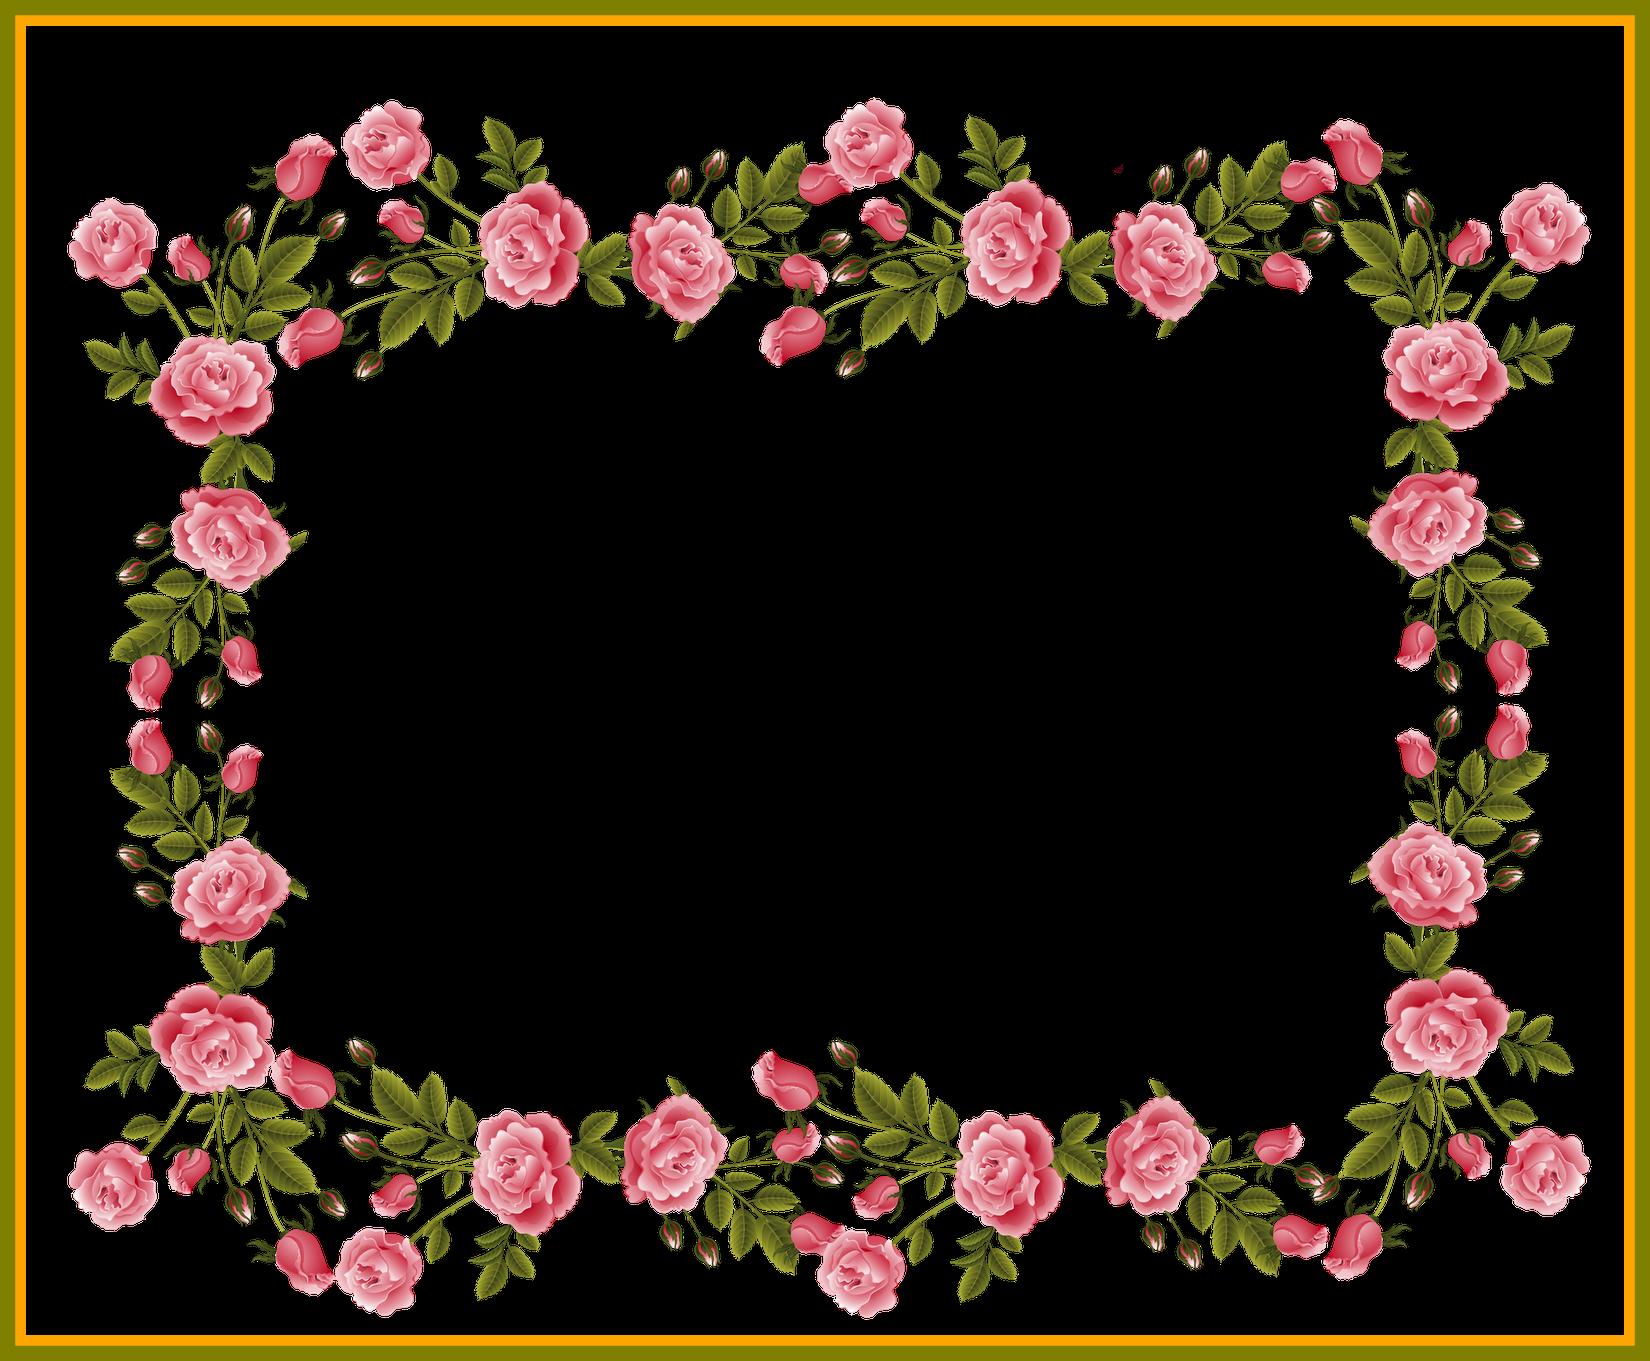 Clipart frames pink rose. Appealing pinkroses scrapbooking album